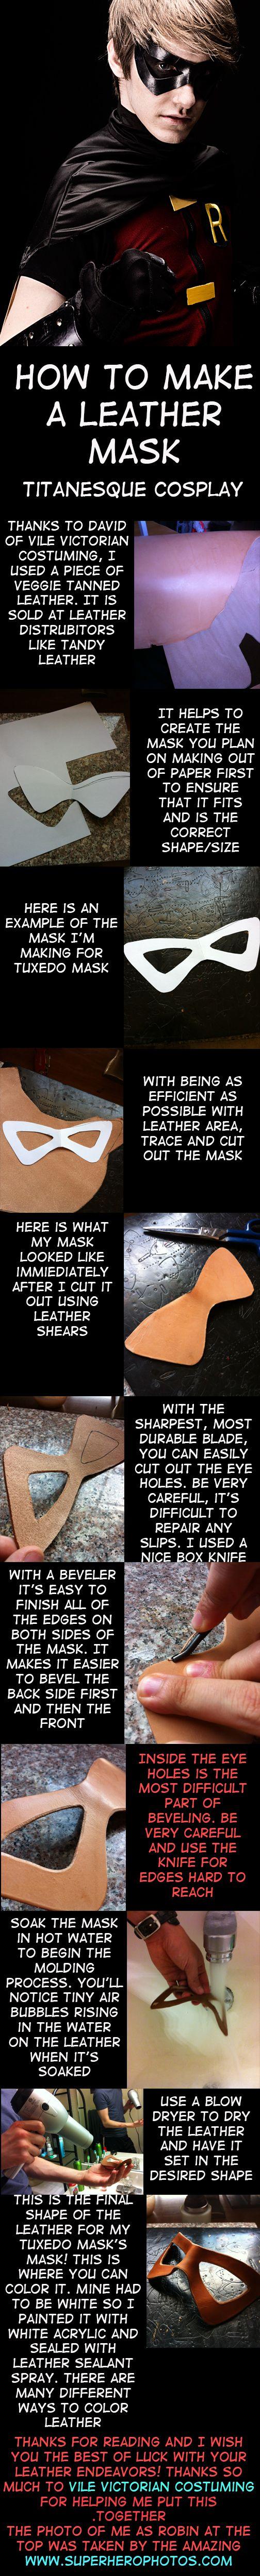 Leather Mask Tutorial by TitanesqueCosplay.deviantart.com on @deviantART